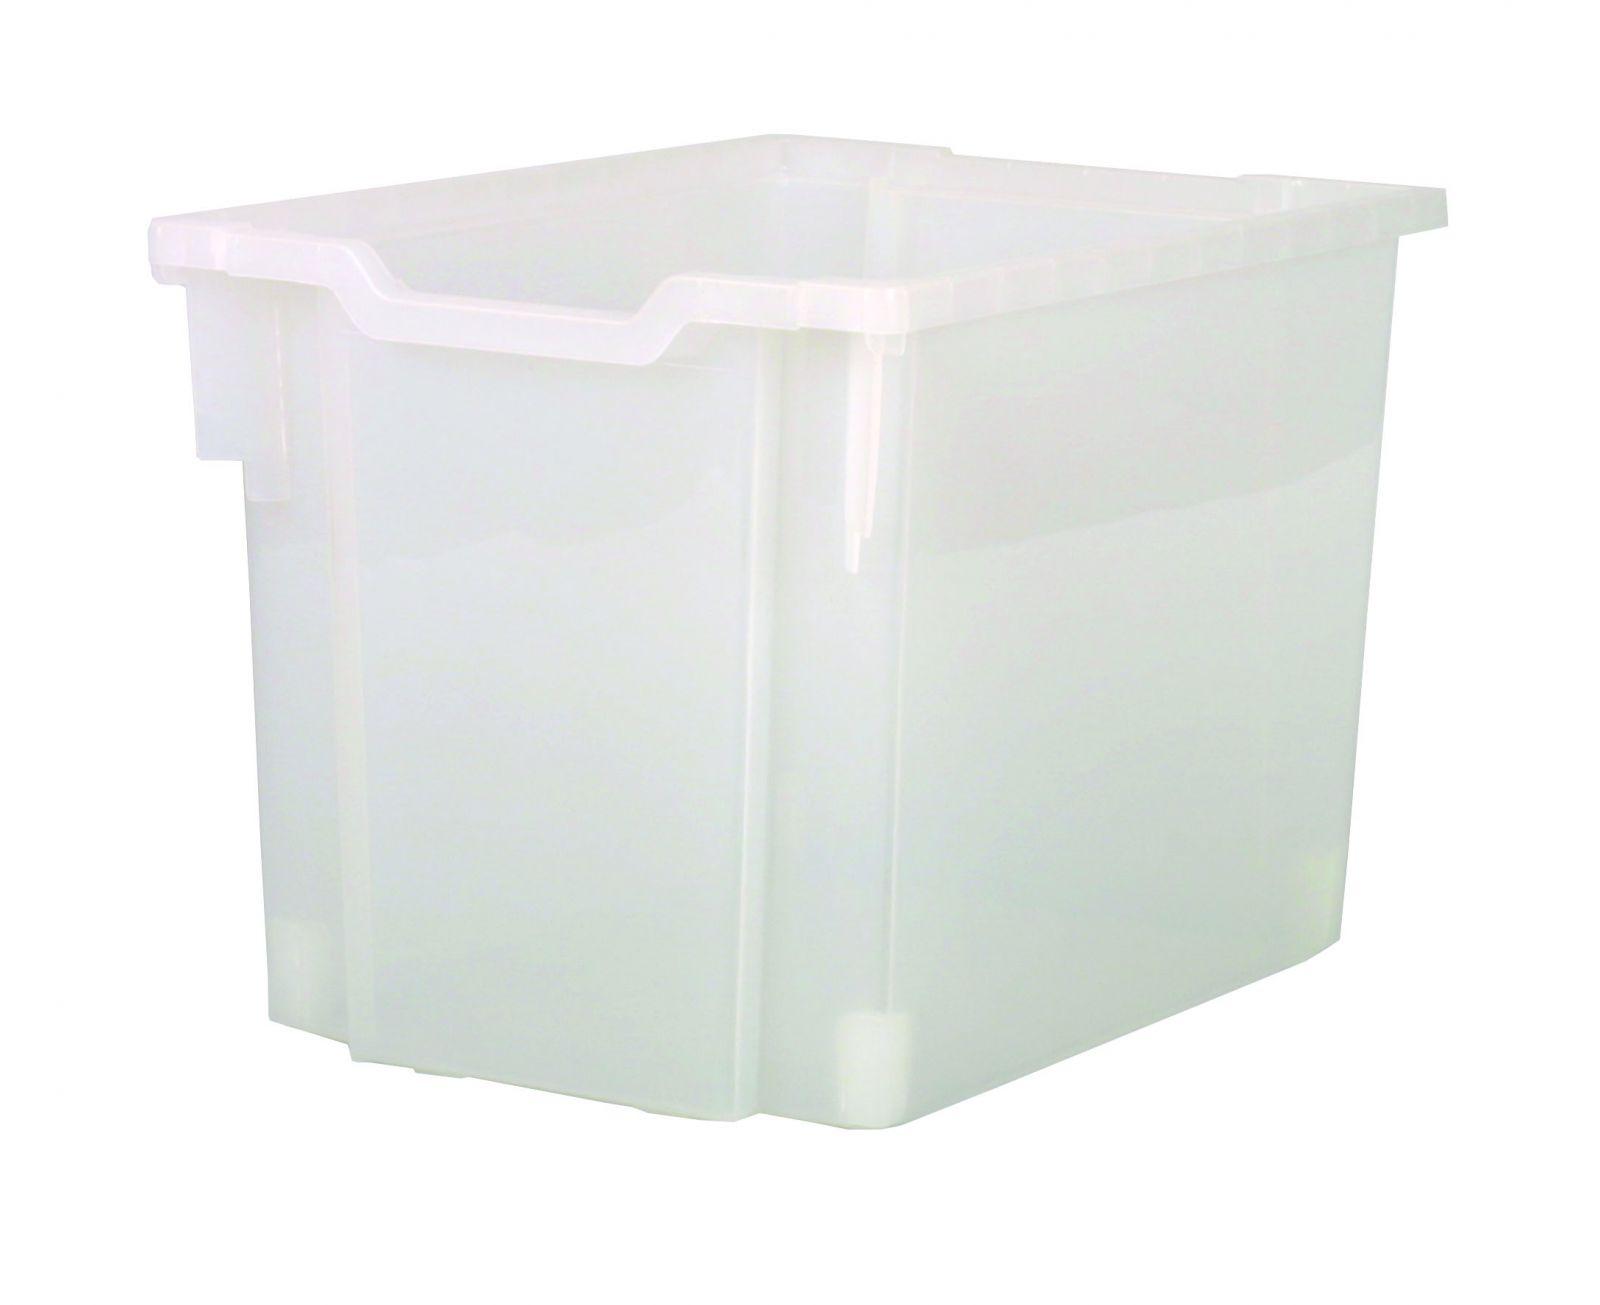 Plastik-box N3 JUMBO - klar Gratnells